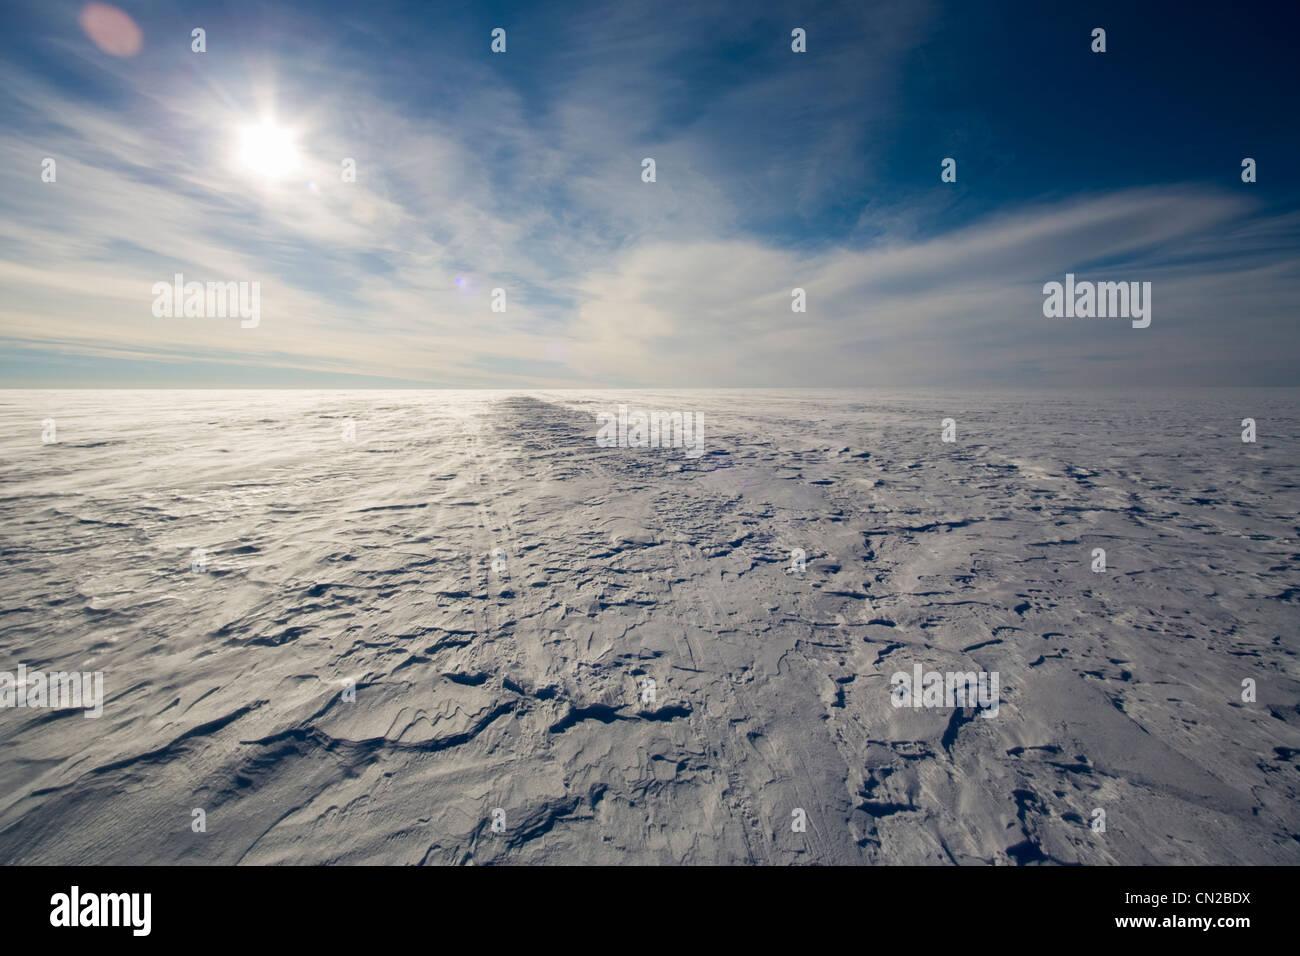 Polar tundra arctic landscape - Ice cap, Greenland - Stock Image